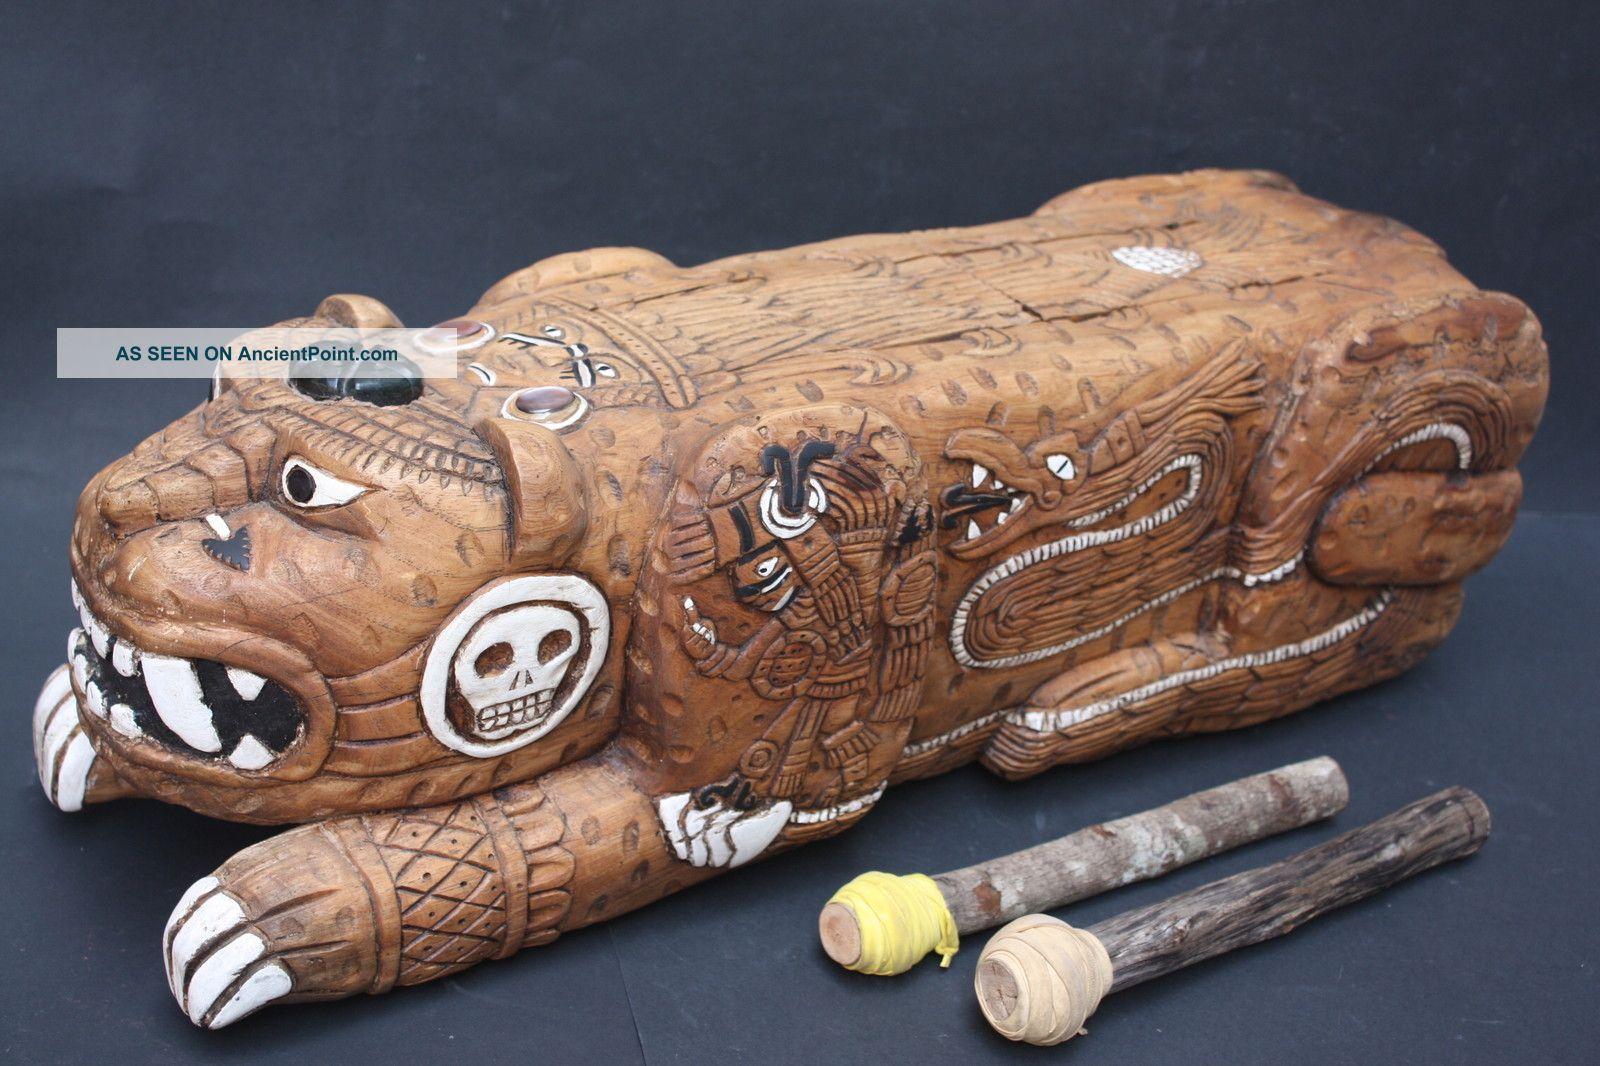 Xxl Teponaztli Drum Mexican Aztec Antique Musical Percussion Ethnic Instrument Percussion photo